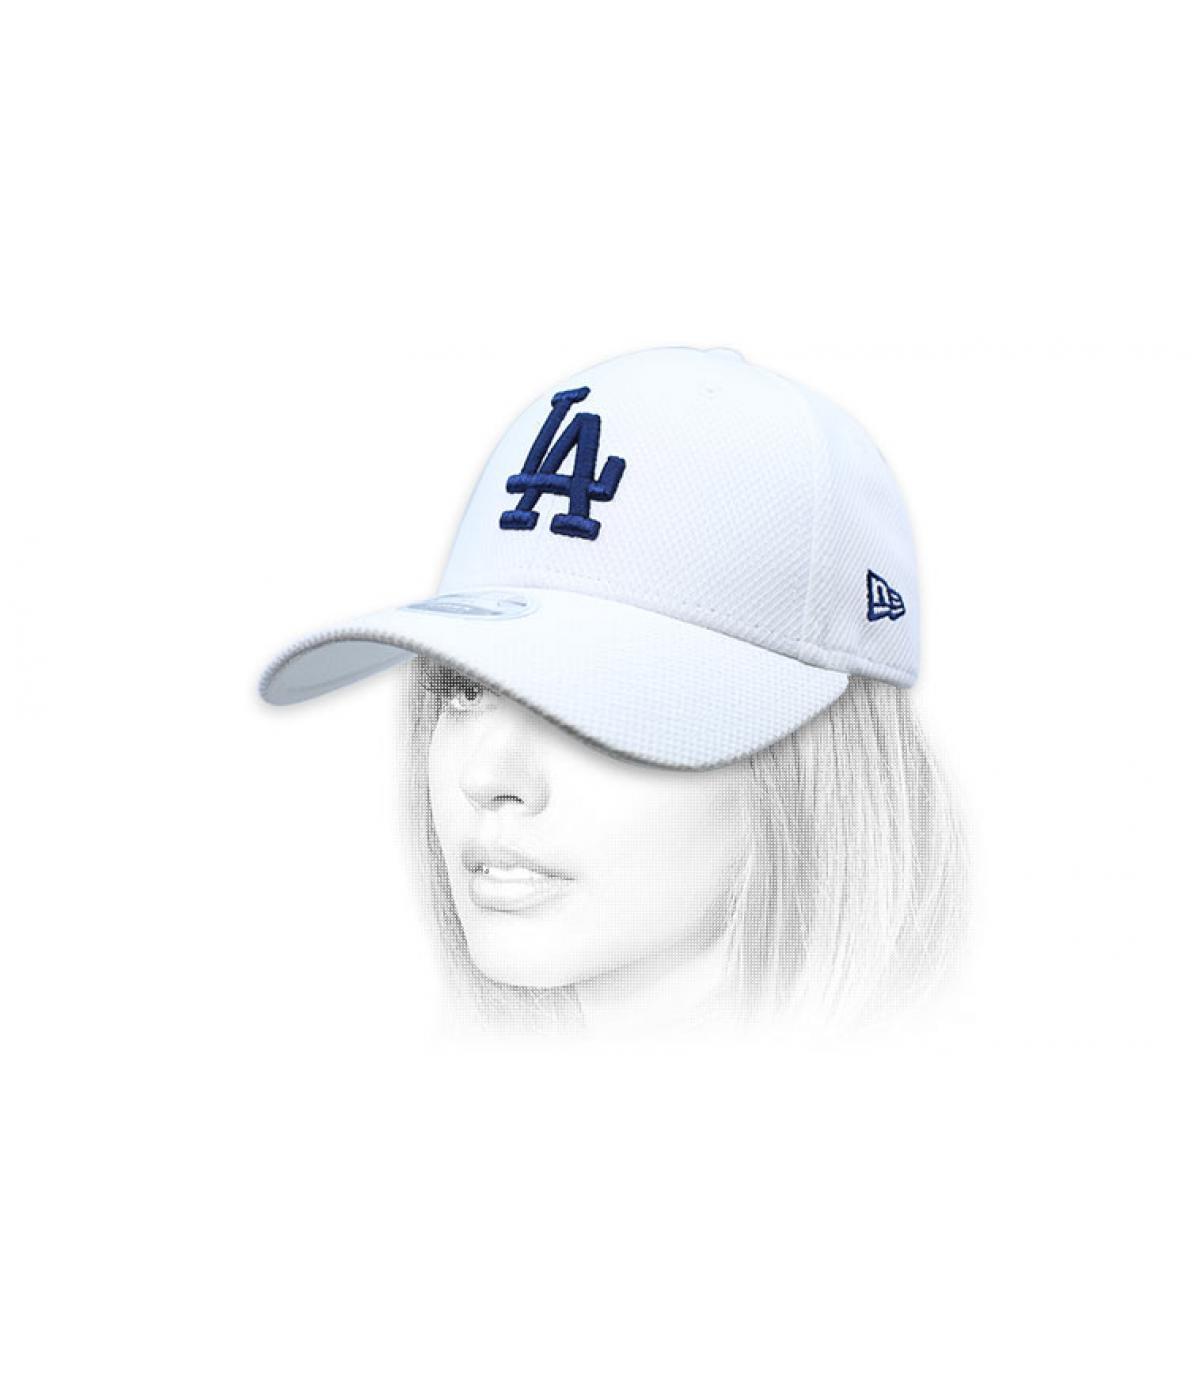 gorra LA mujer blanco azul